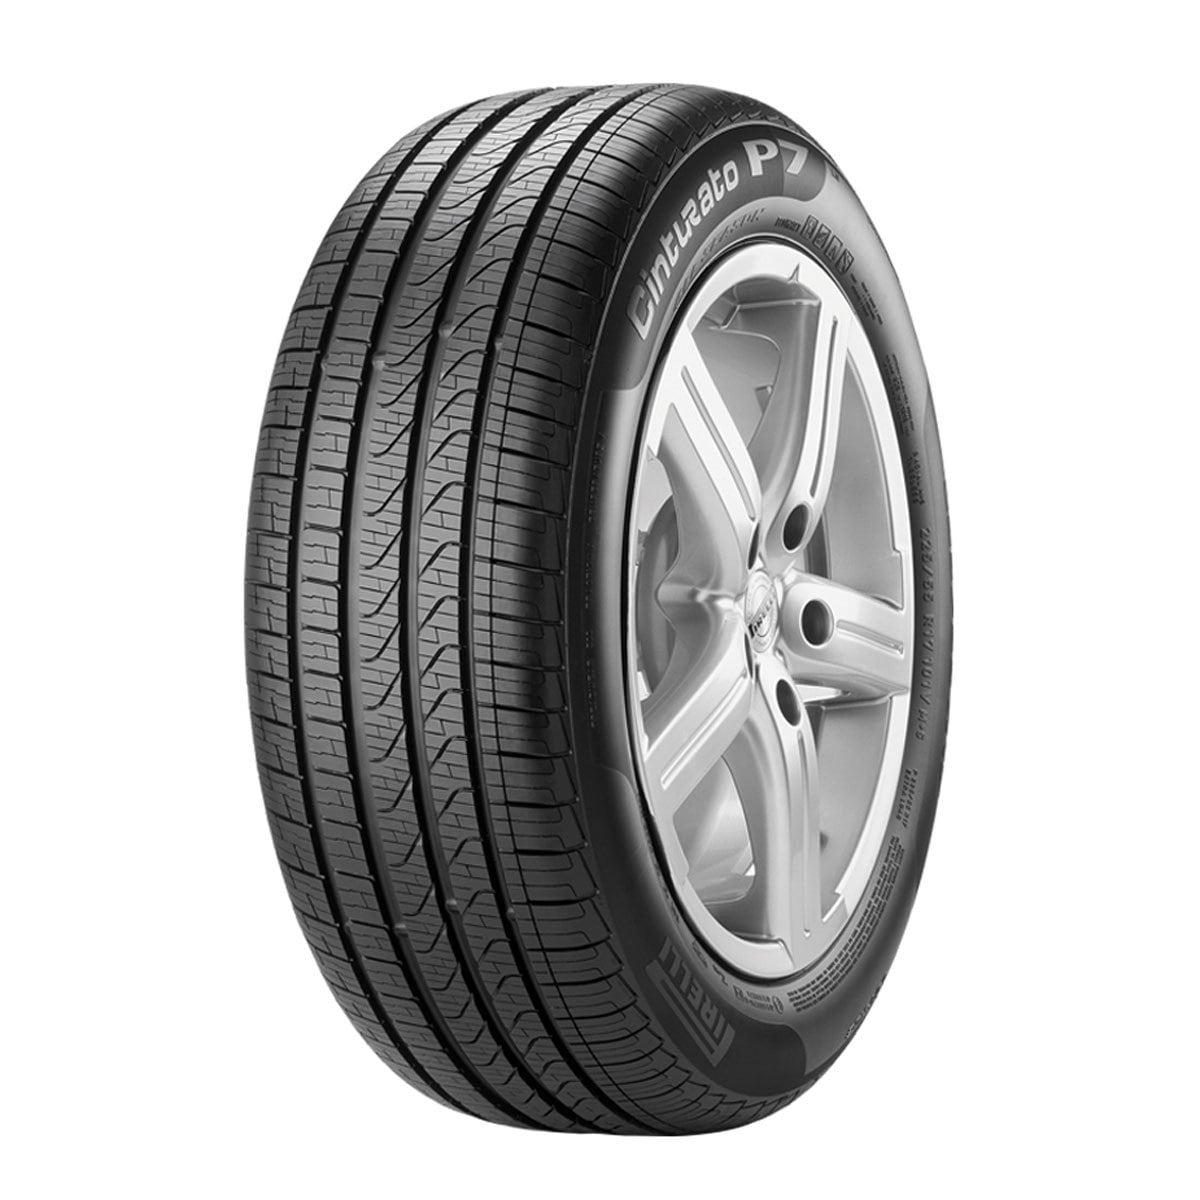 Spllanta 225 45 R17 P7 As Xl 94V Pirelli